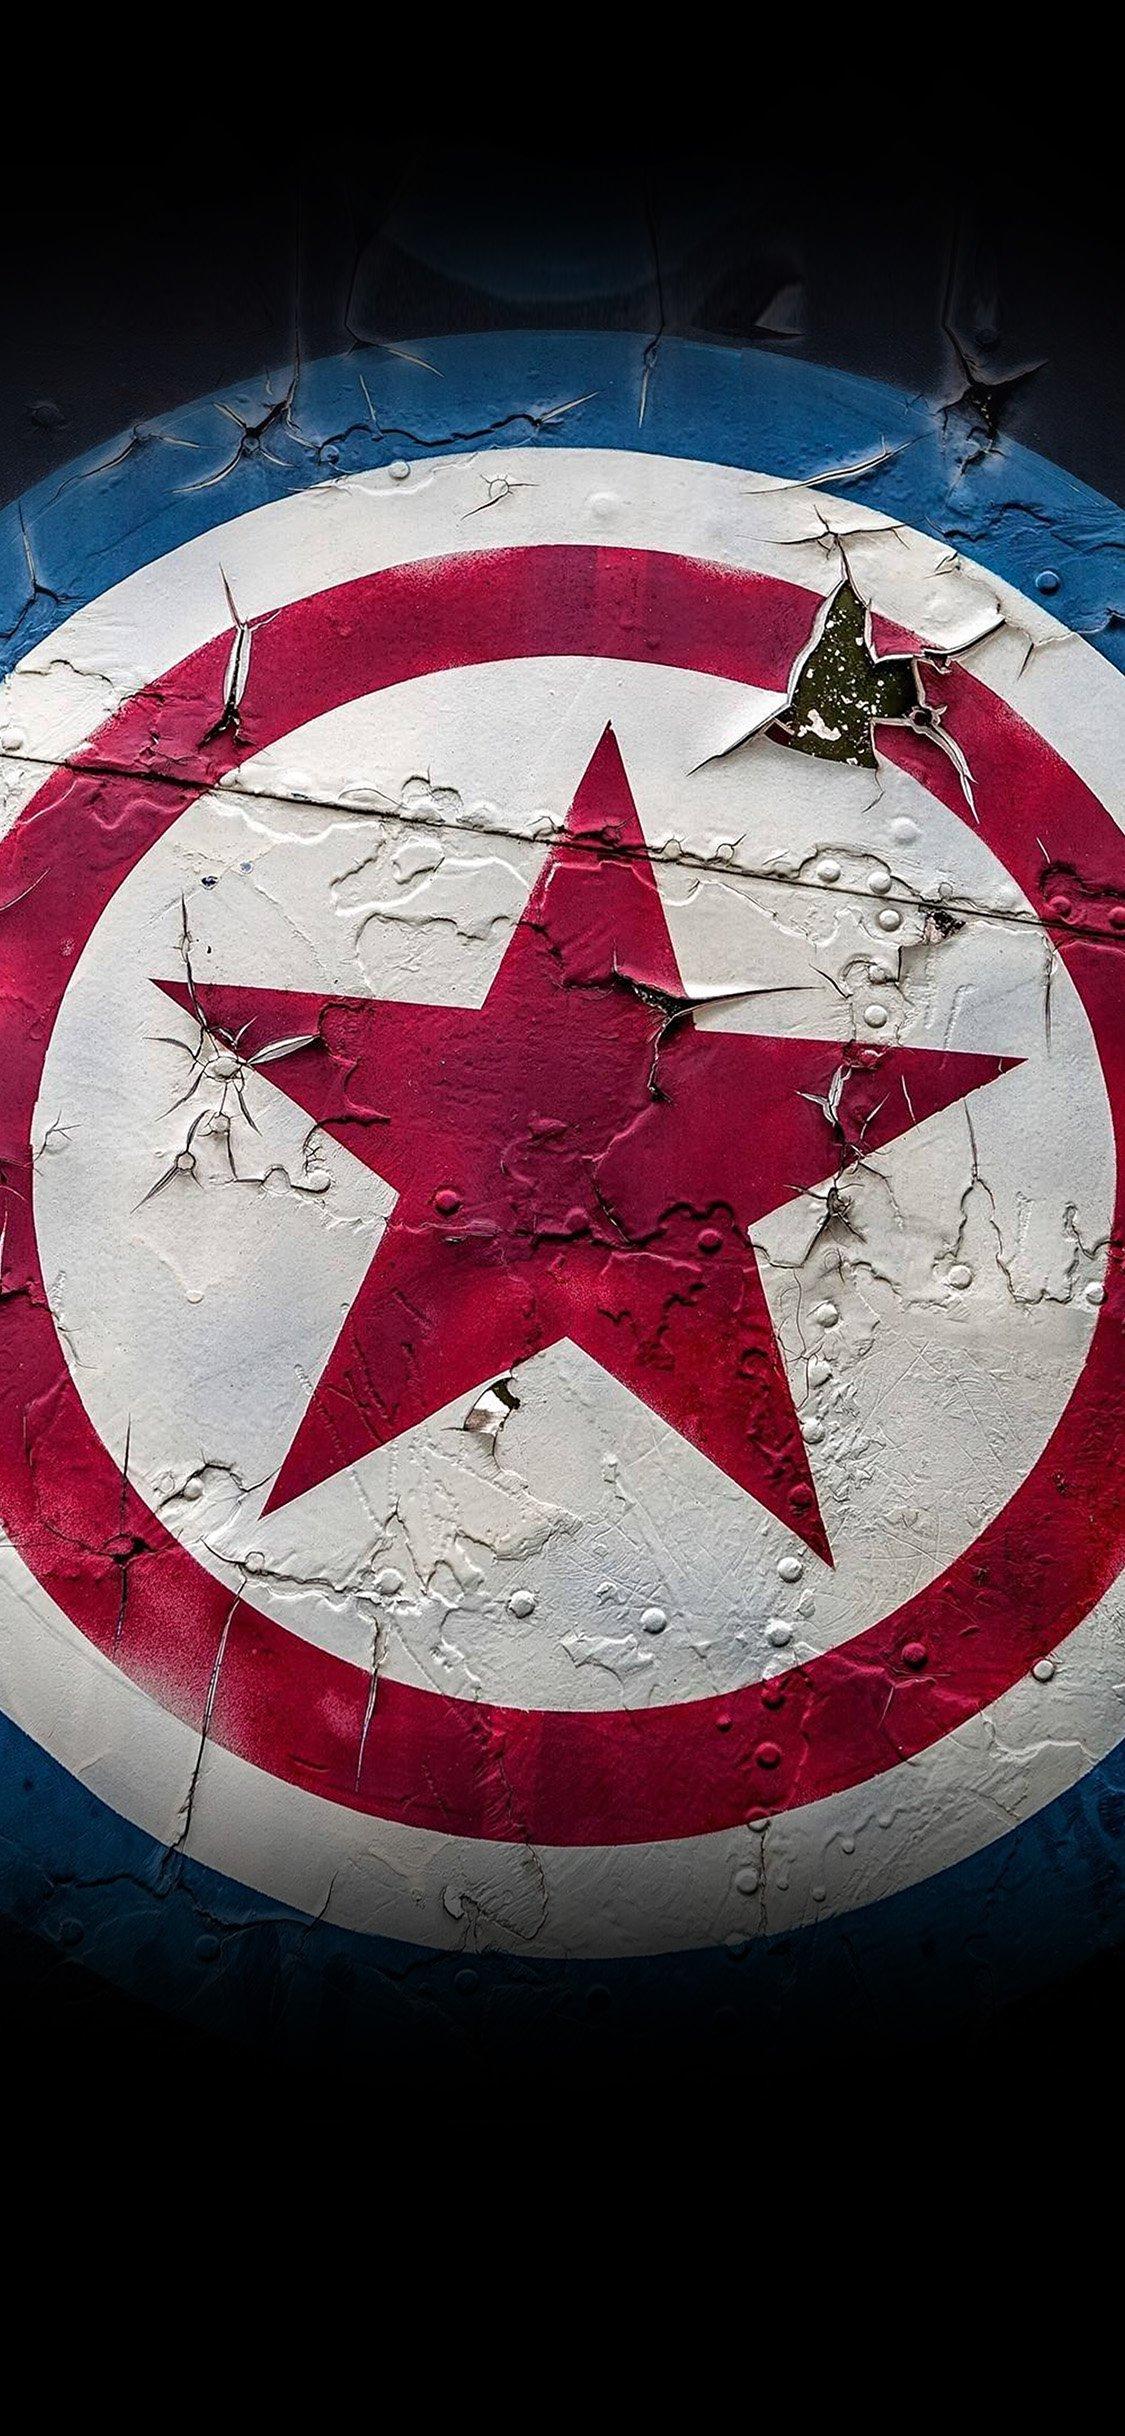 Captain america marvel hero iPhone X